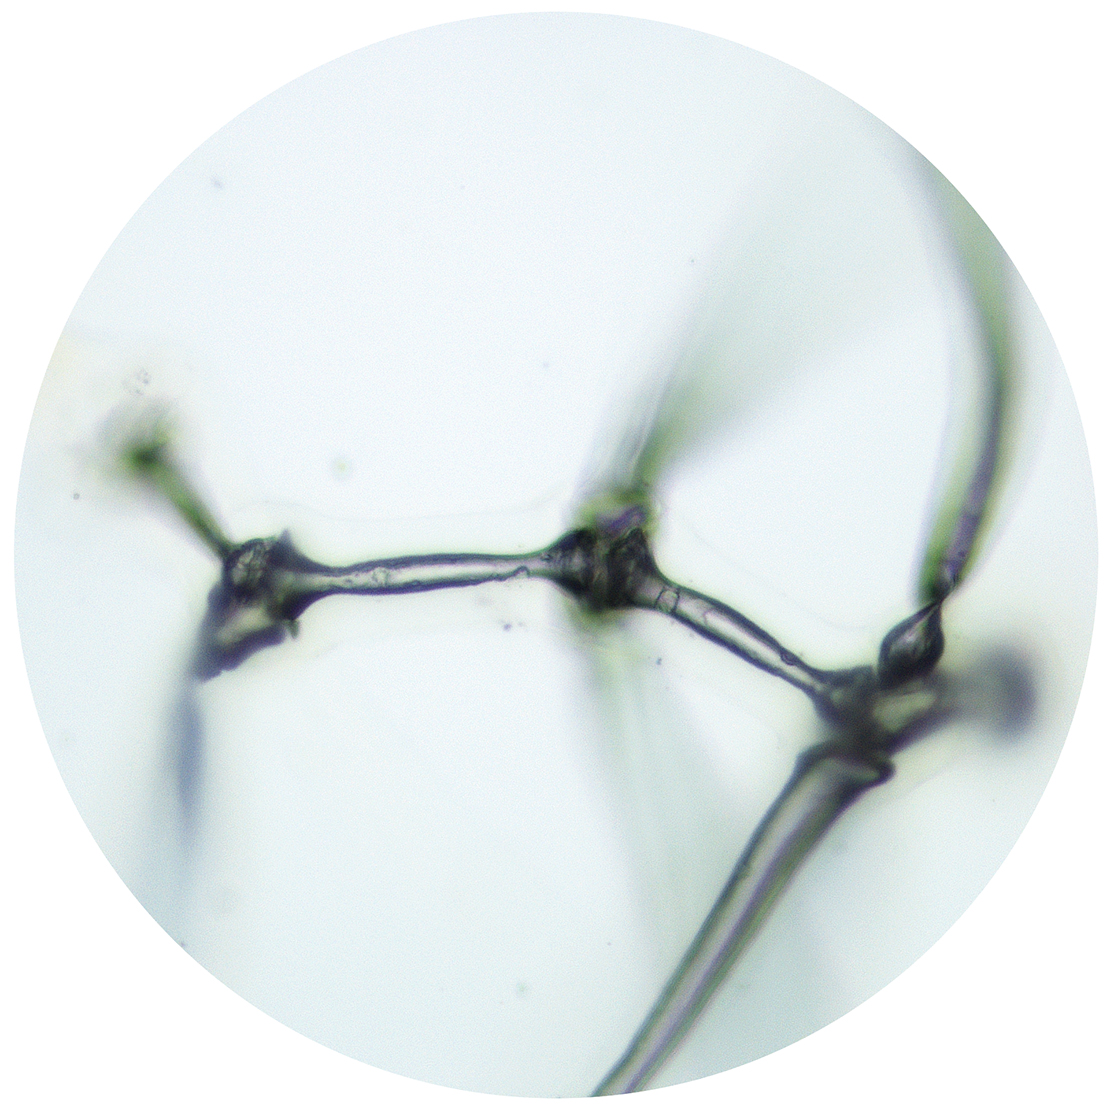 Sean Miller, Microscopy of Dust Sample Collected from Frankfurt Museum of Modern Art, Frankfurt, Germany.